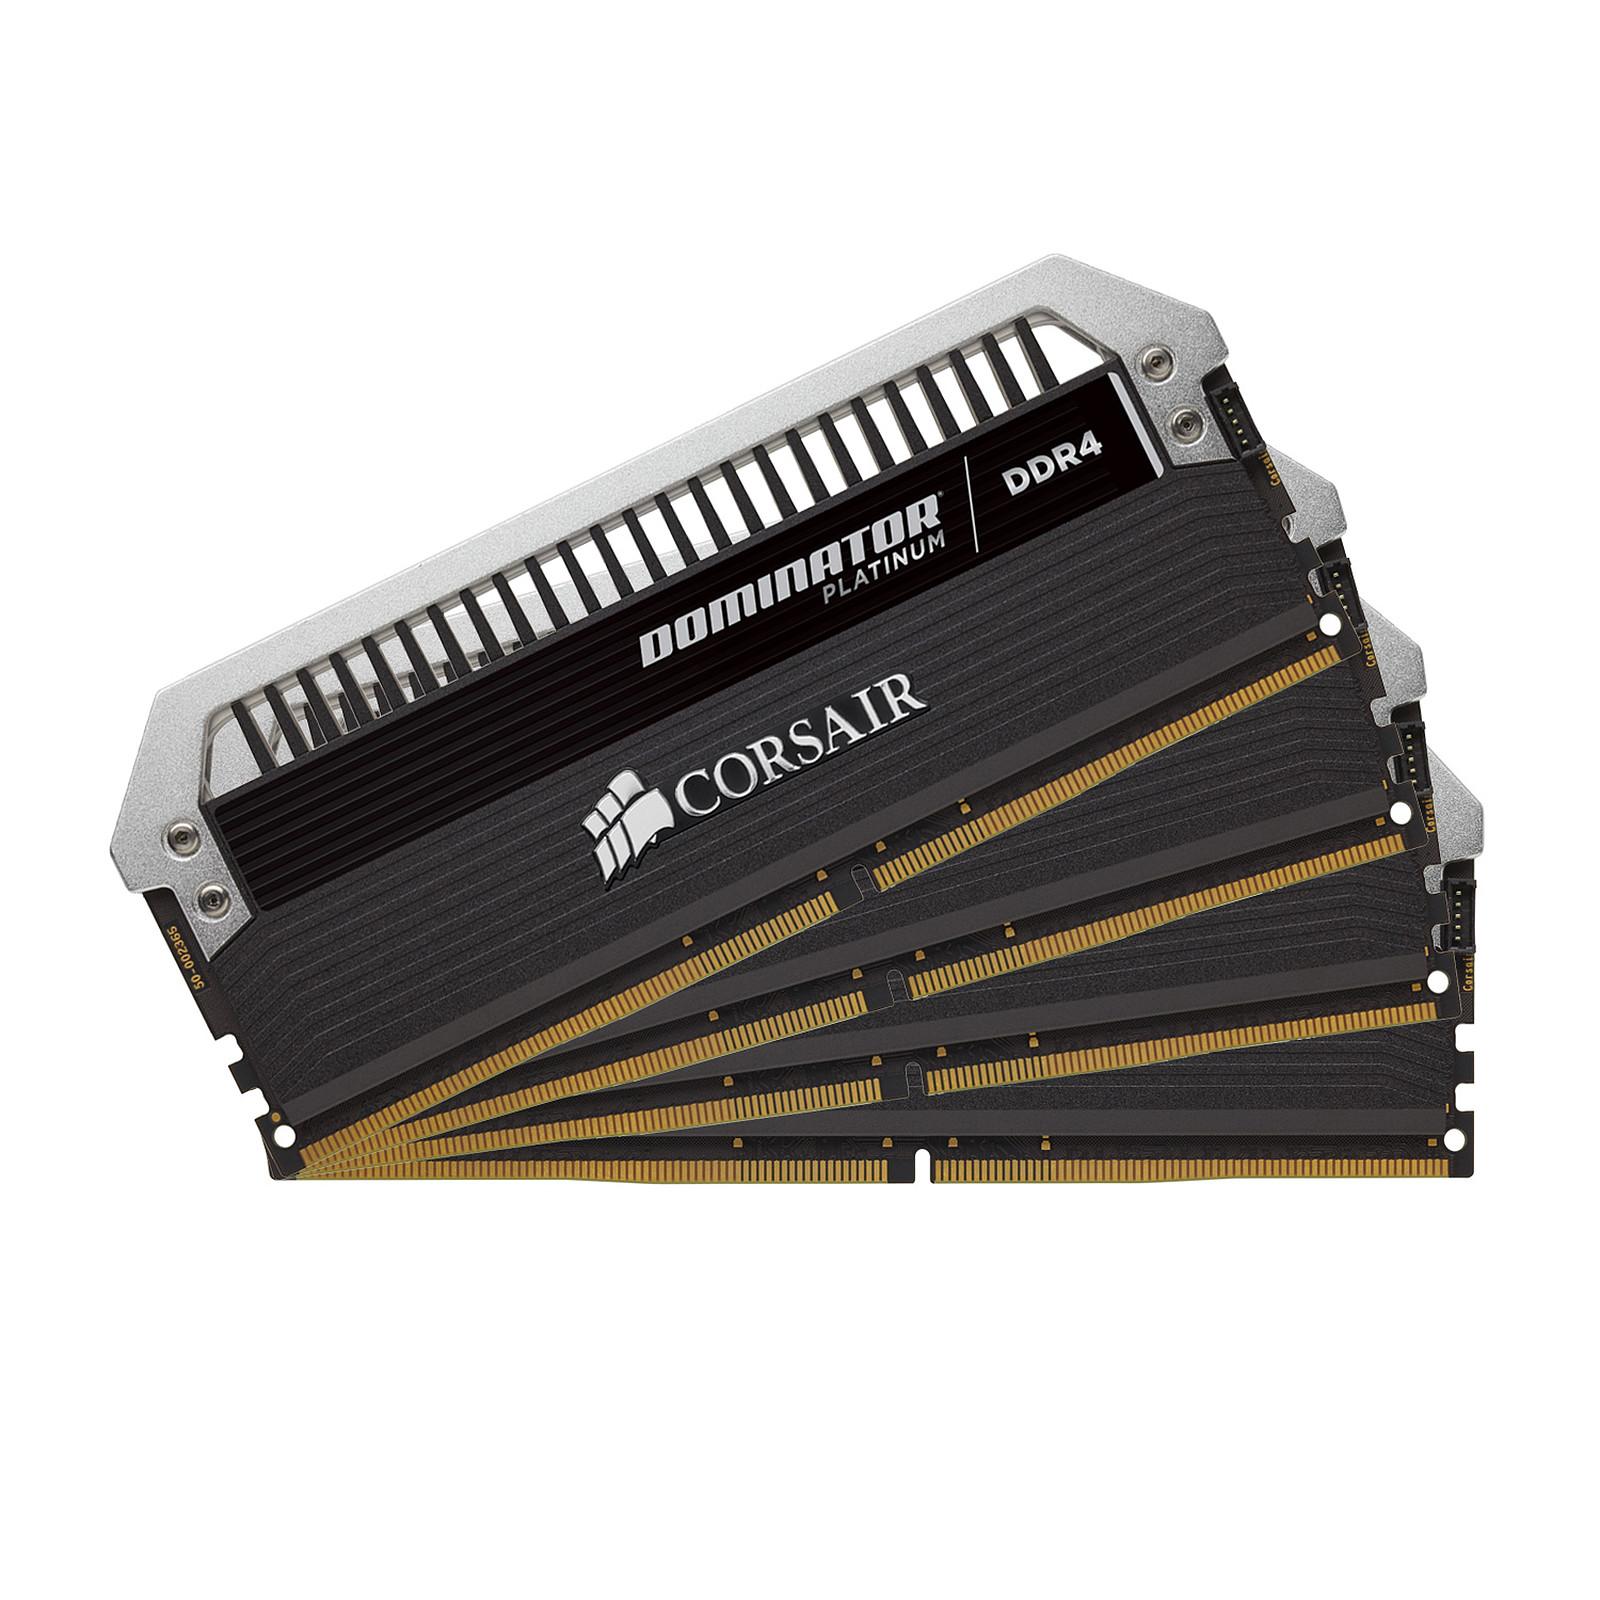 Corsair Dominator Platinum 32 Go (4x 8 Go) DDR4 3466 MHz CL16